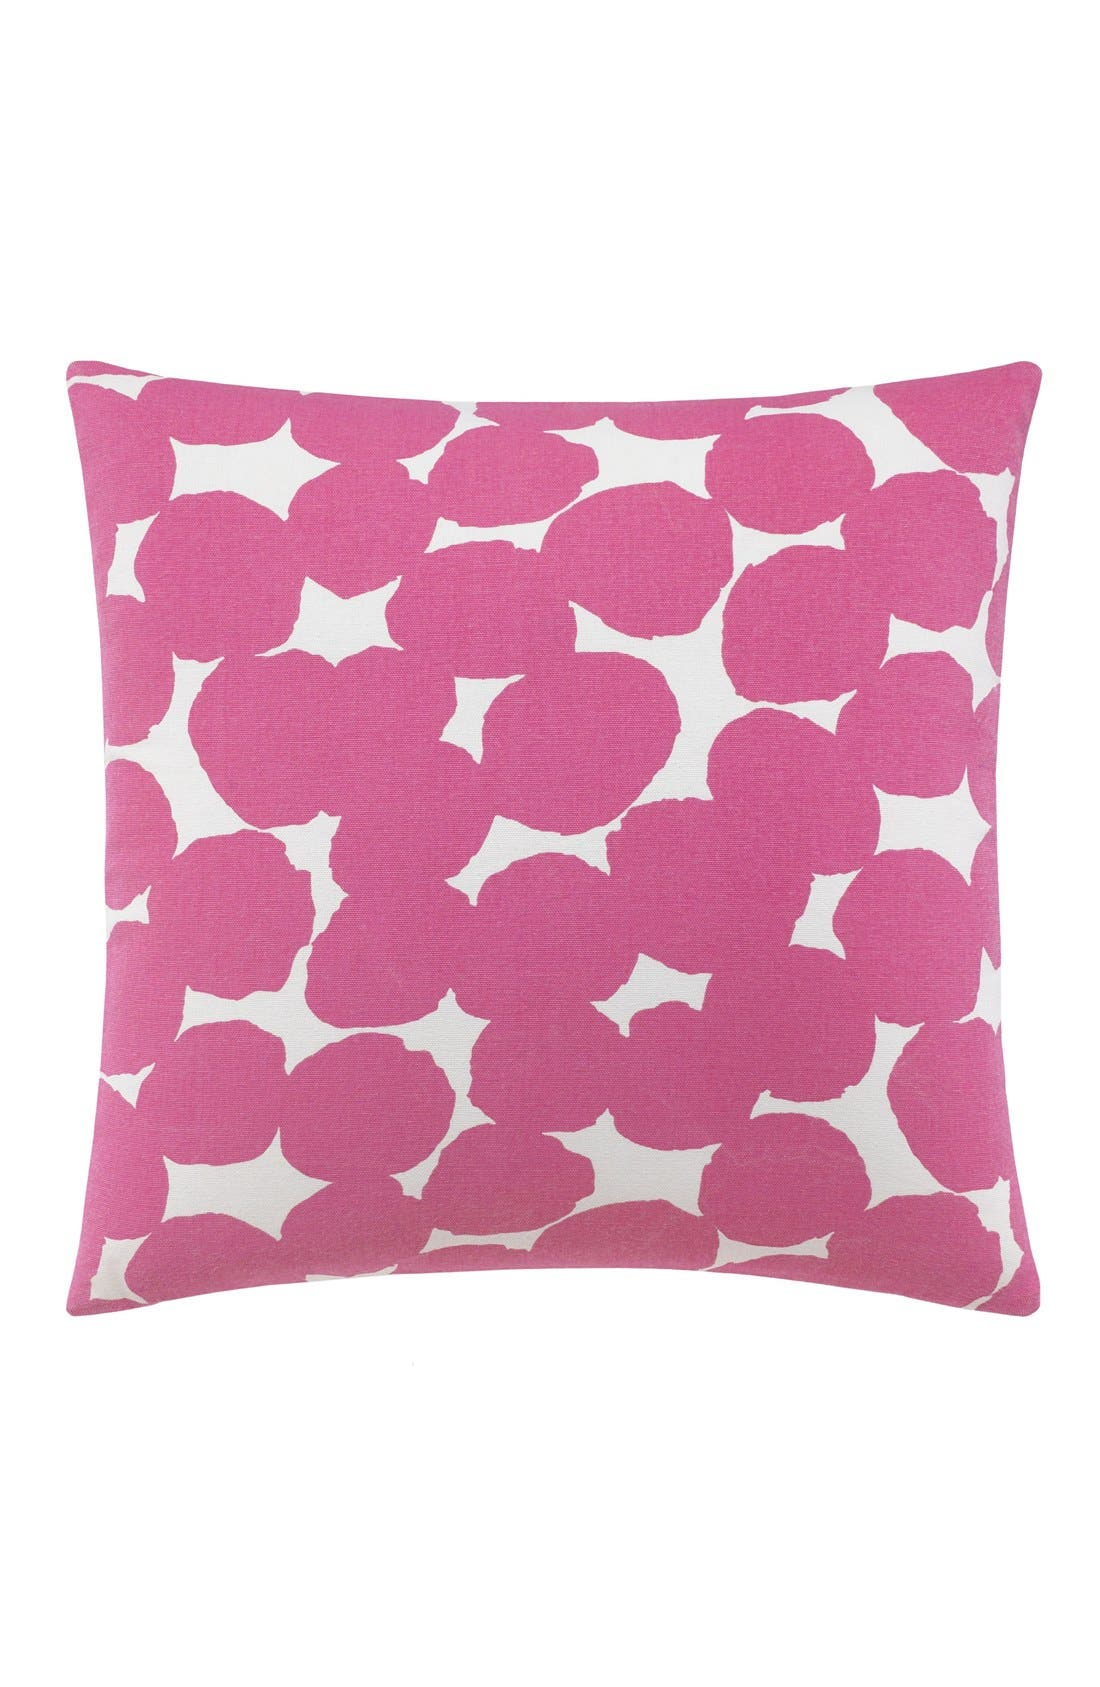 Alternate Image 1 Selected - kate spade new york 'random dot' accent pillow